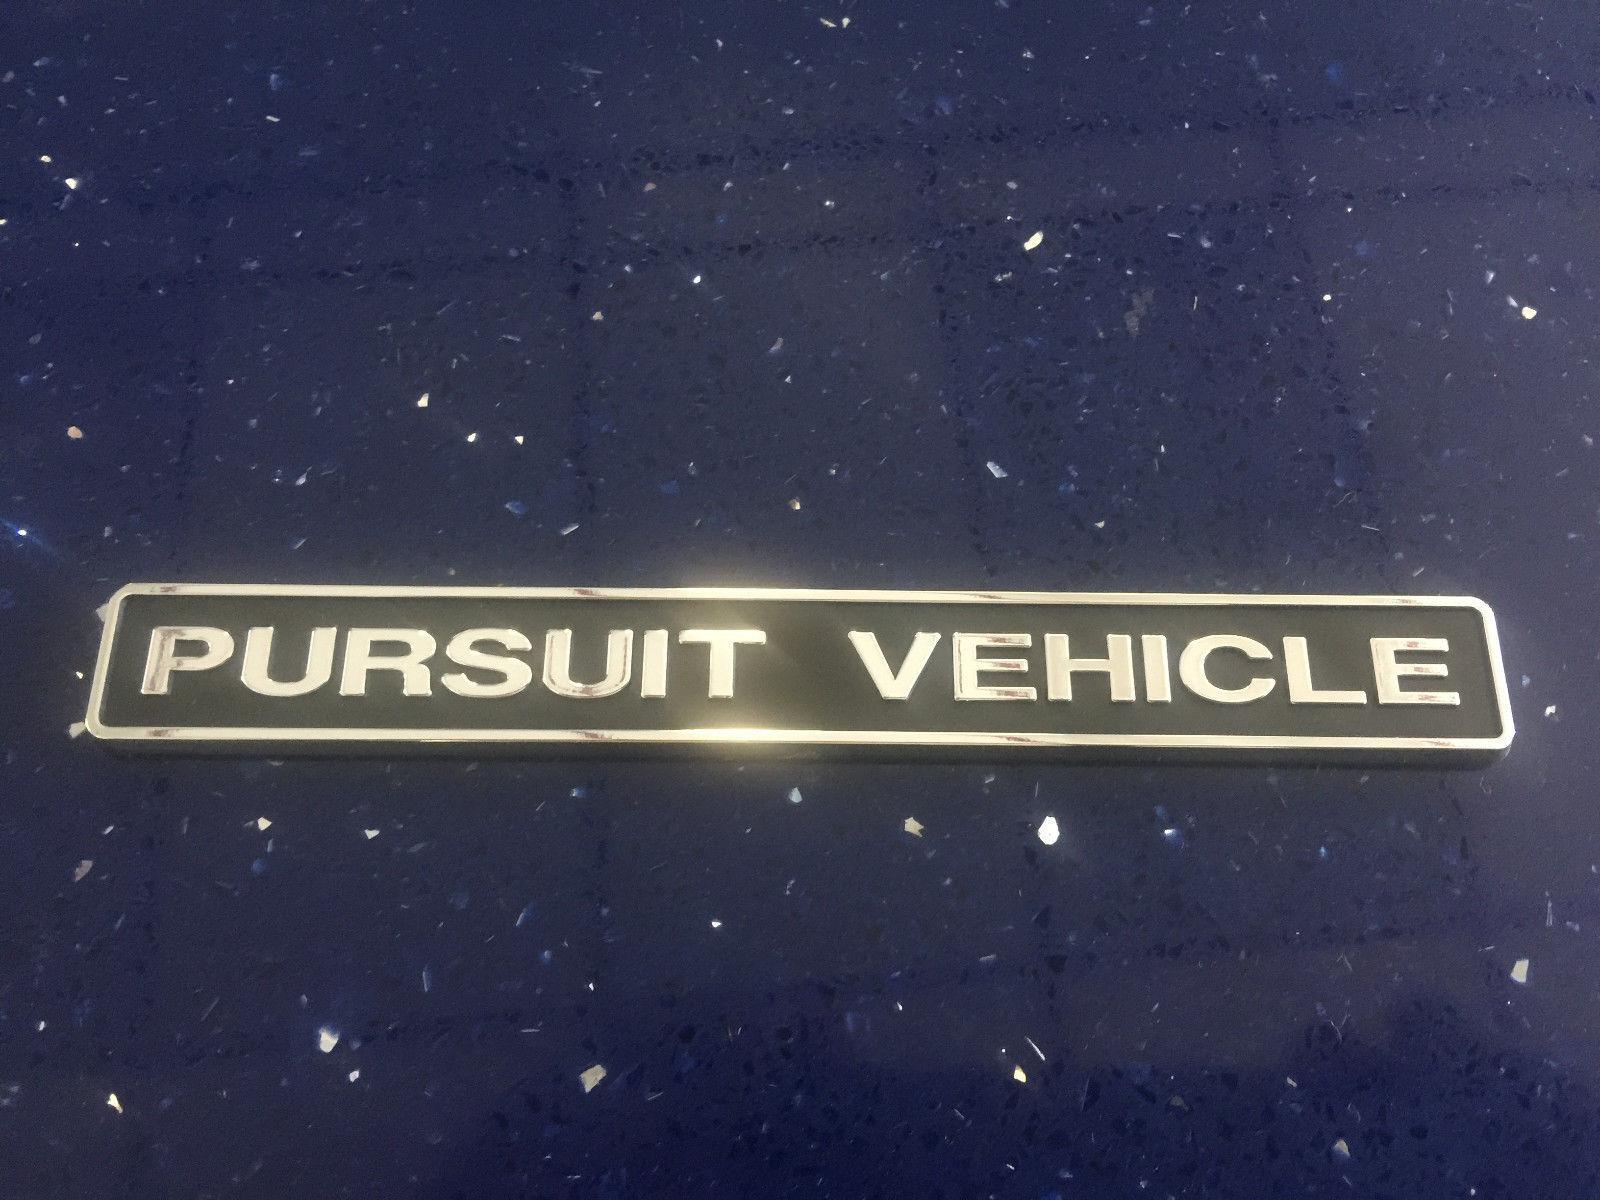 Tvr For Sale Usa >> Police Interceptor Pursuit Vehicle Emblem Hard Plastic New ...